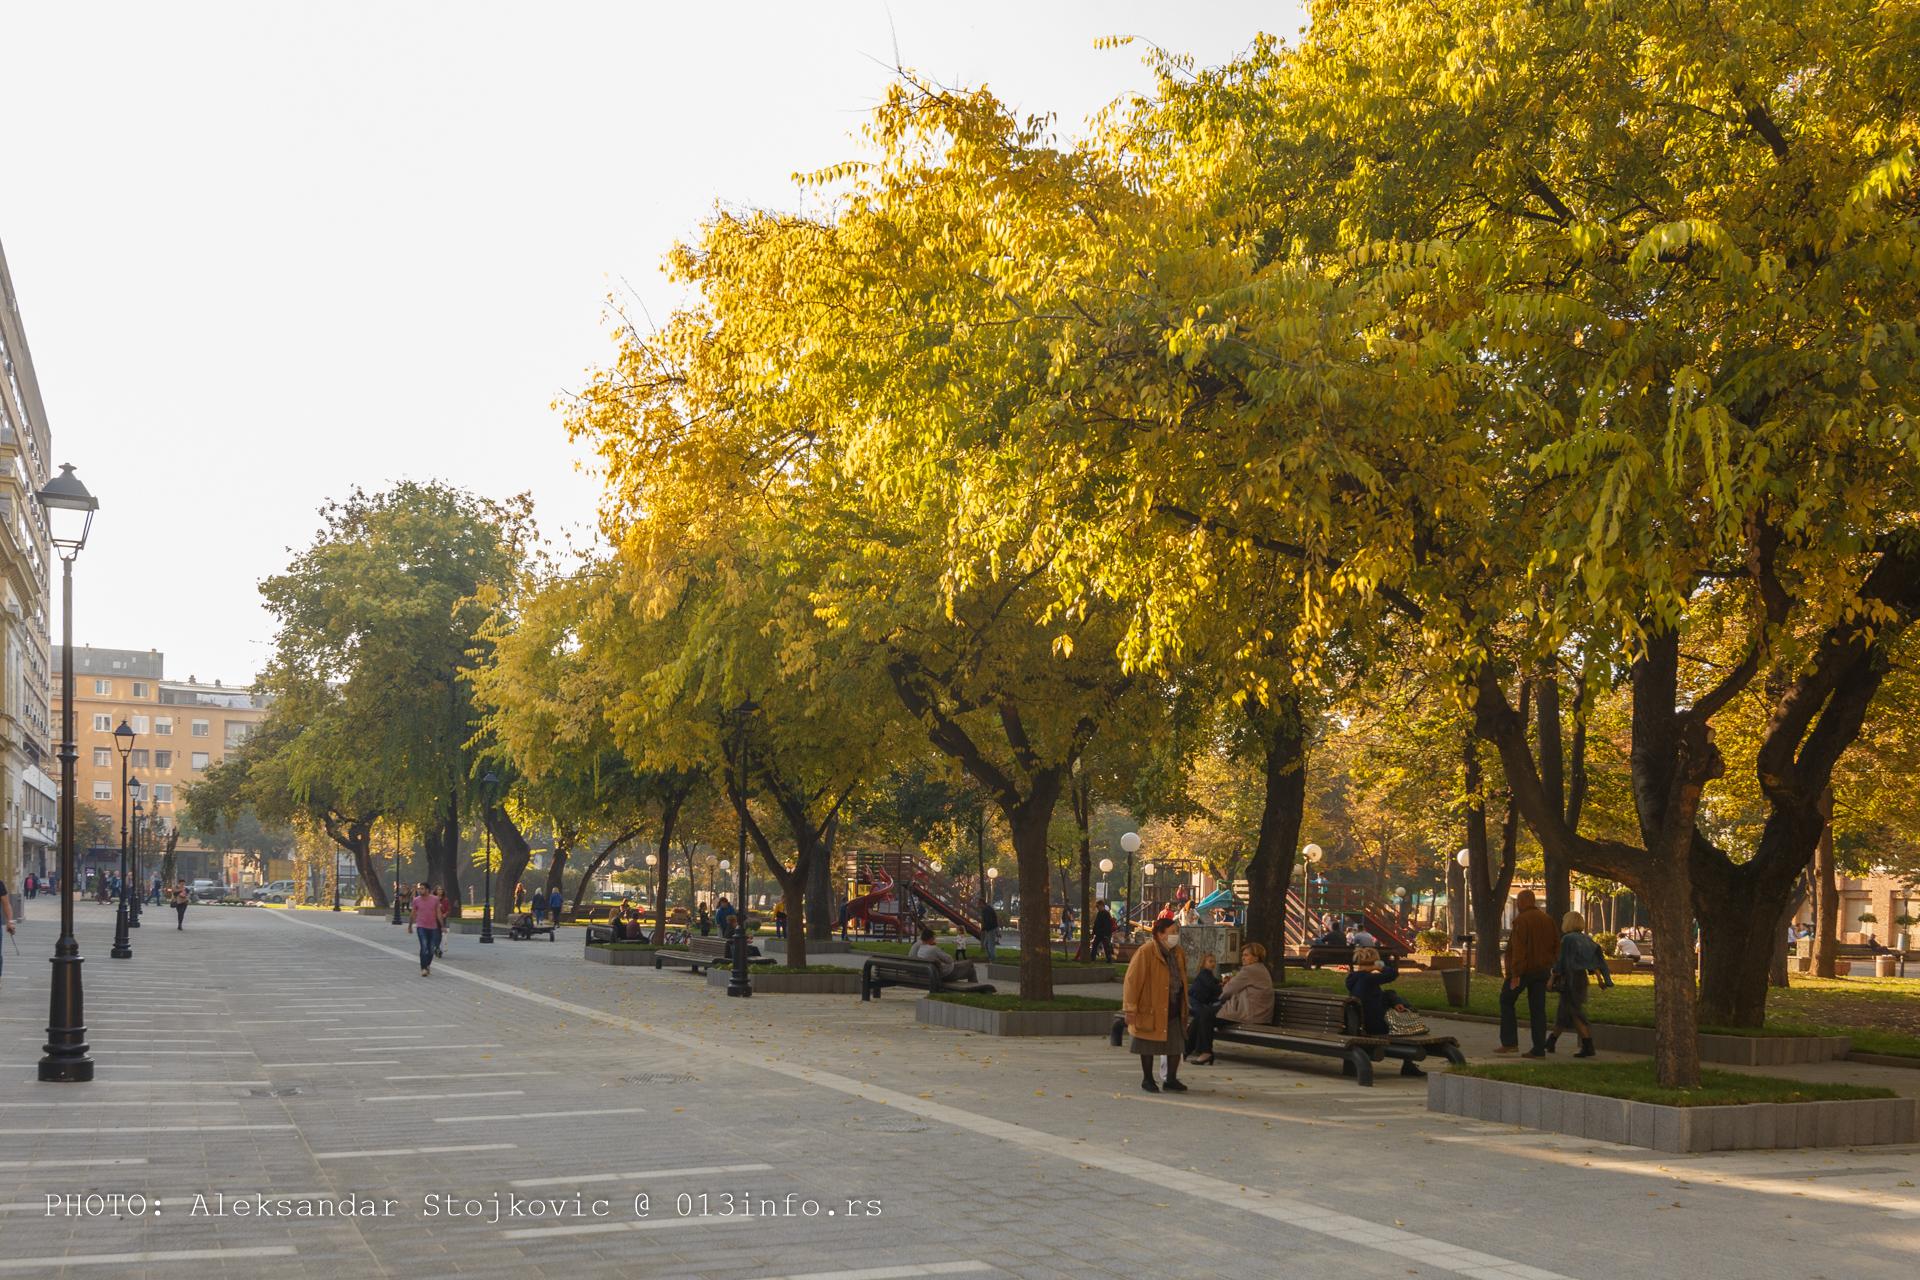 Šetalište pored parka rekonstruisano